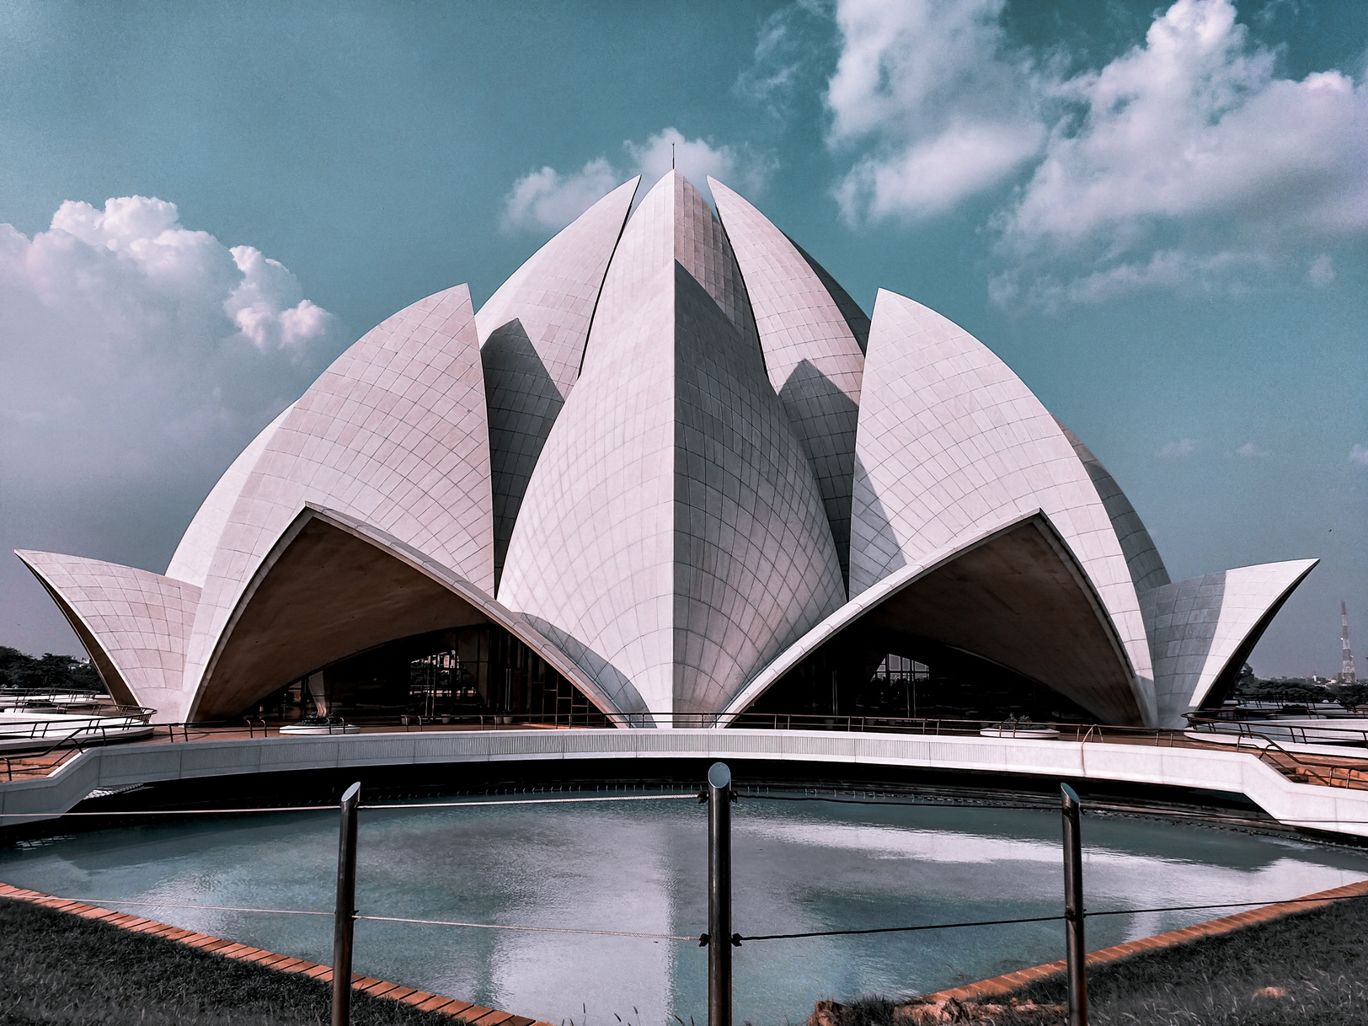 Photo of Lotus Temple By Renu Bagry